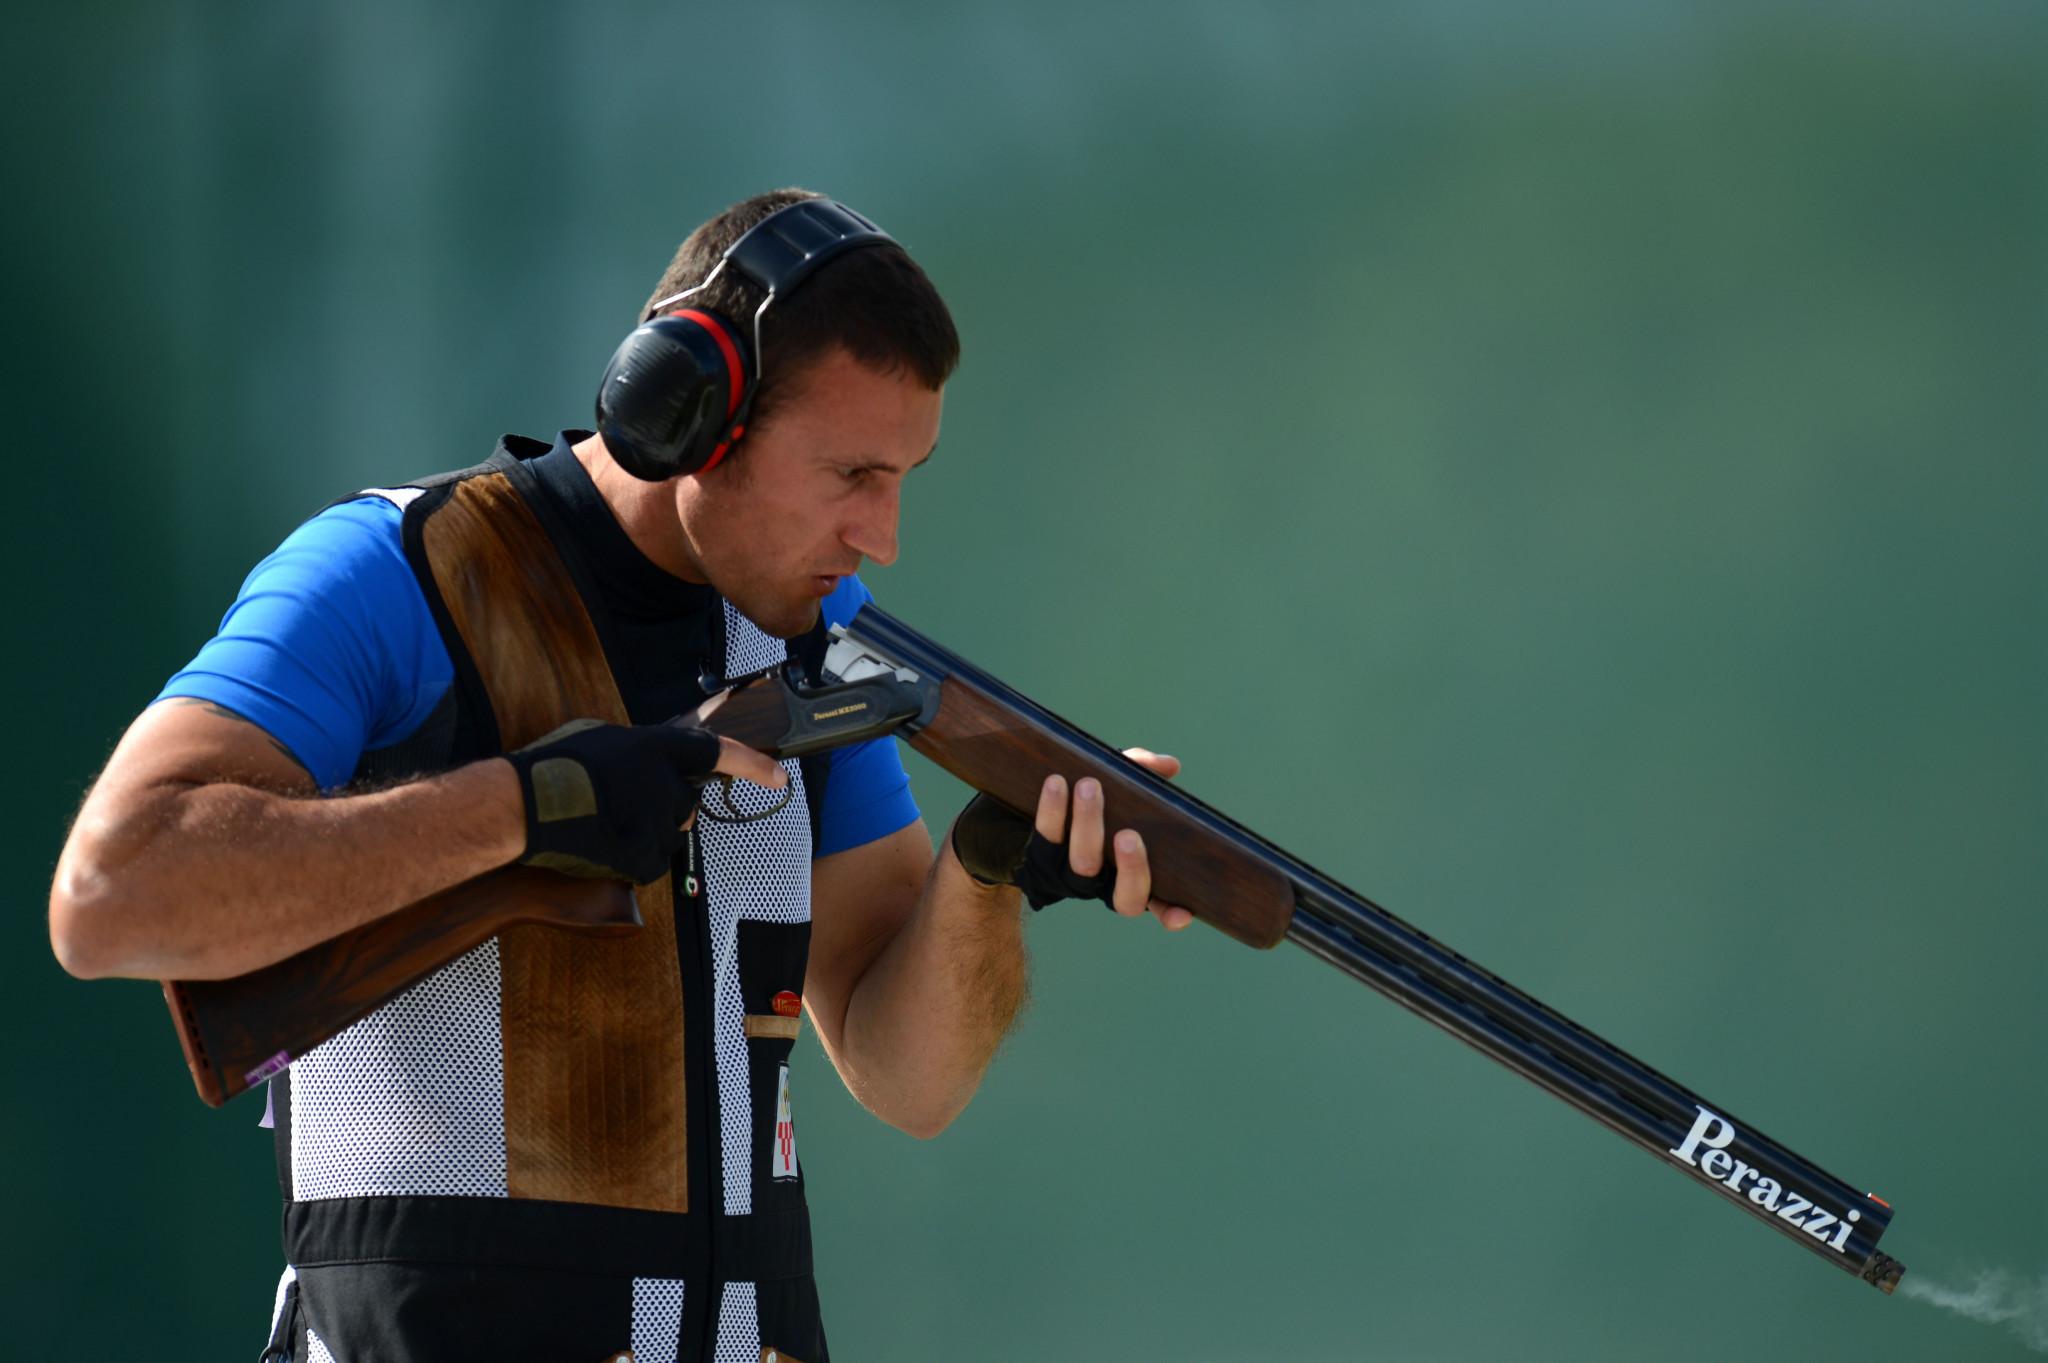 Croatia's Giovanni Cernogoraz won a bronze medal on home soil ©Getty Images